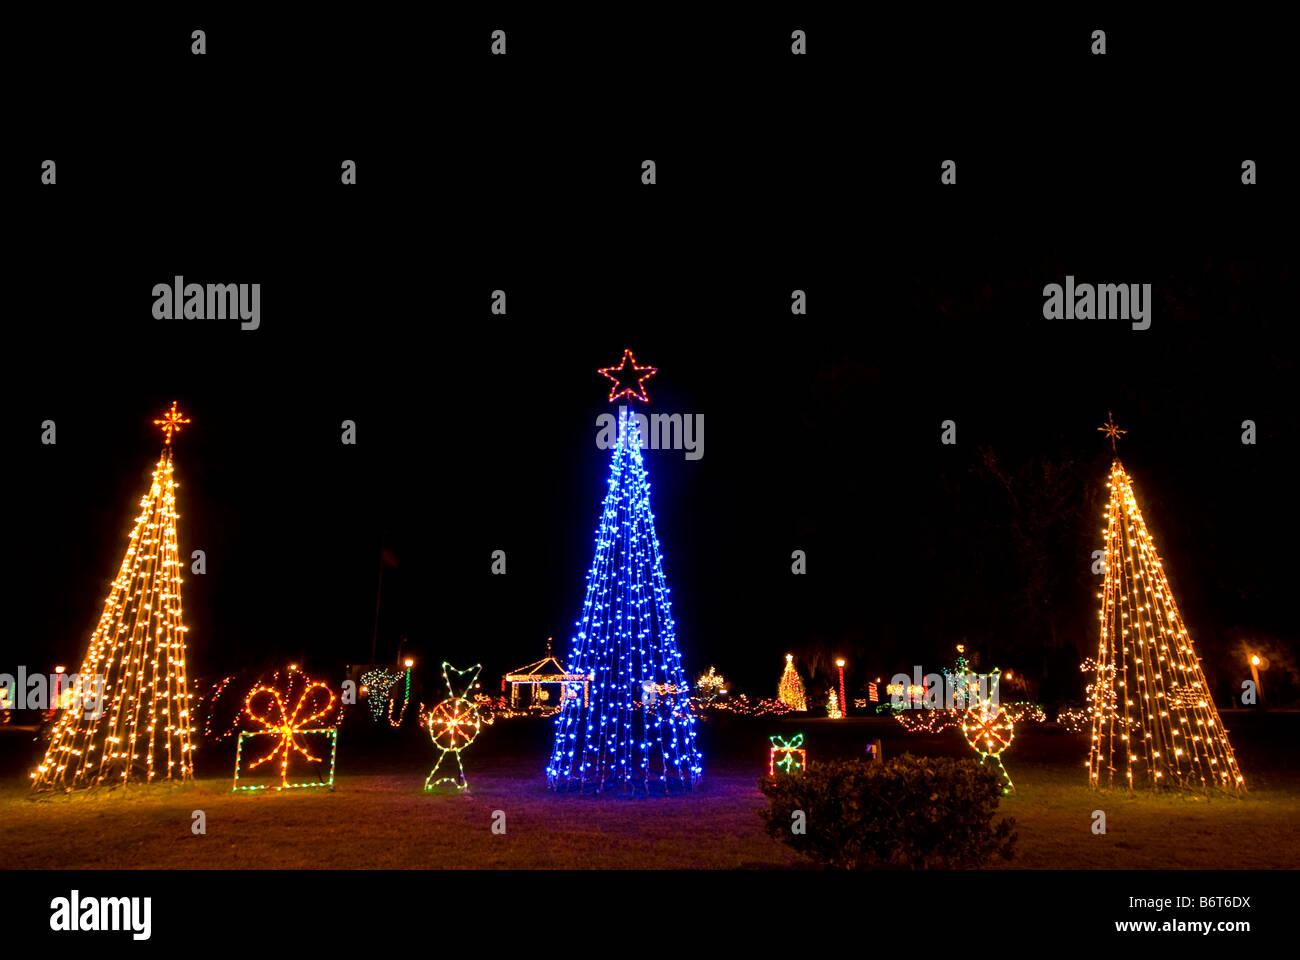 christmas trees stockfotos christmas trees bilder alamy. Black Bedroom Furniture Sets. Home Design Ideas